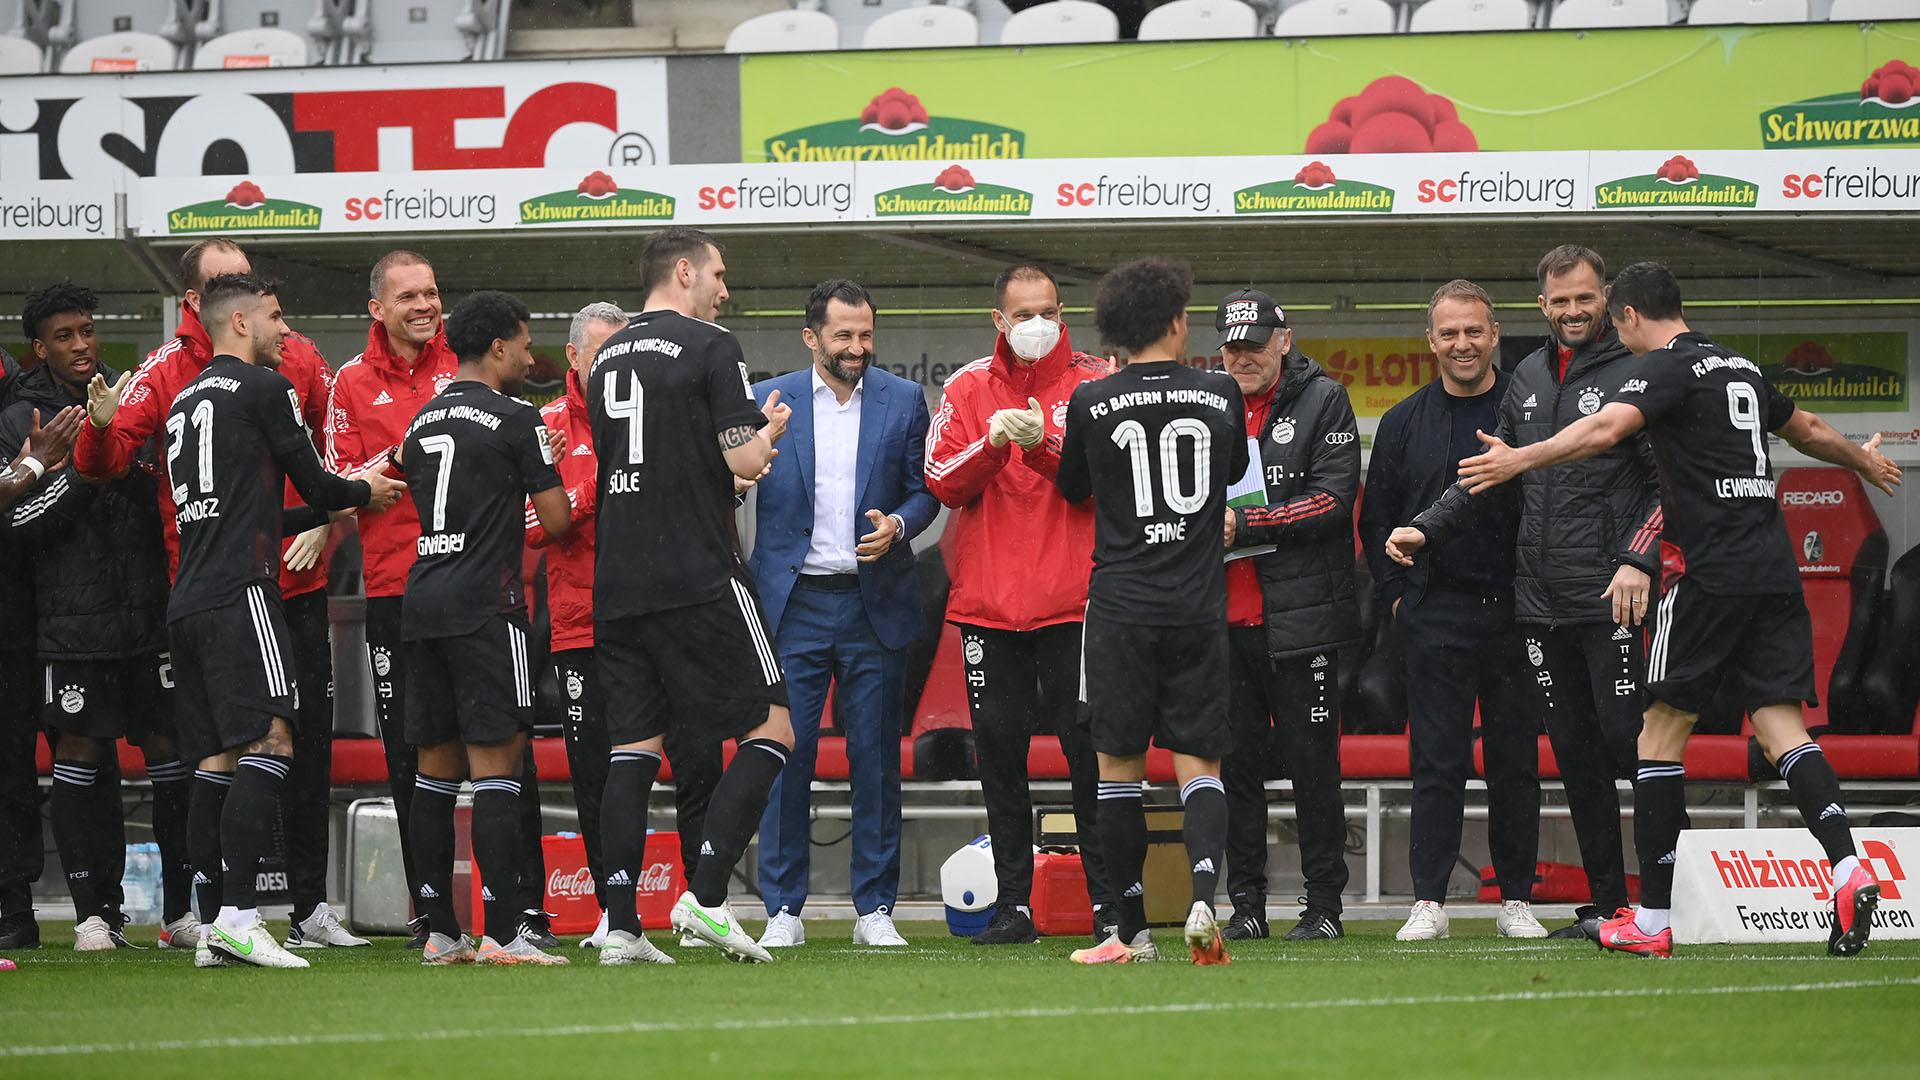 Lewandowski matches Muller record with 40th Bundesliga goal of the season for Bayern Munich